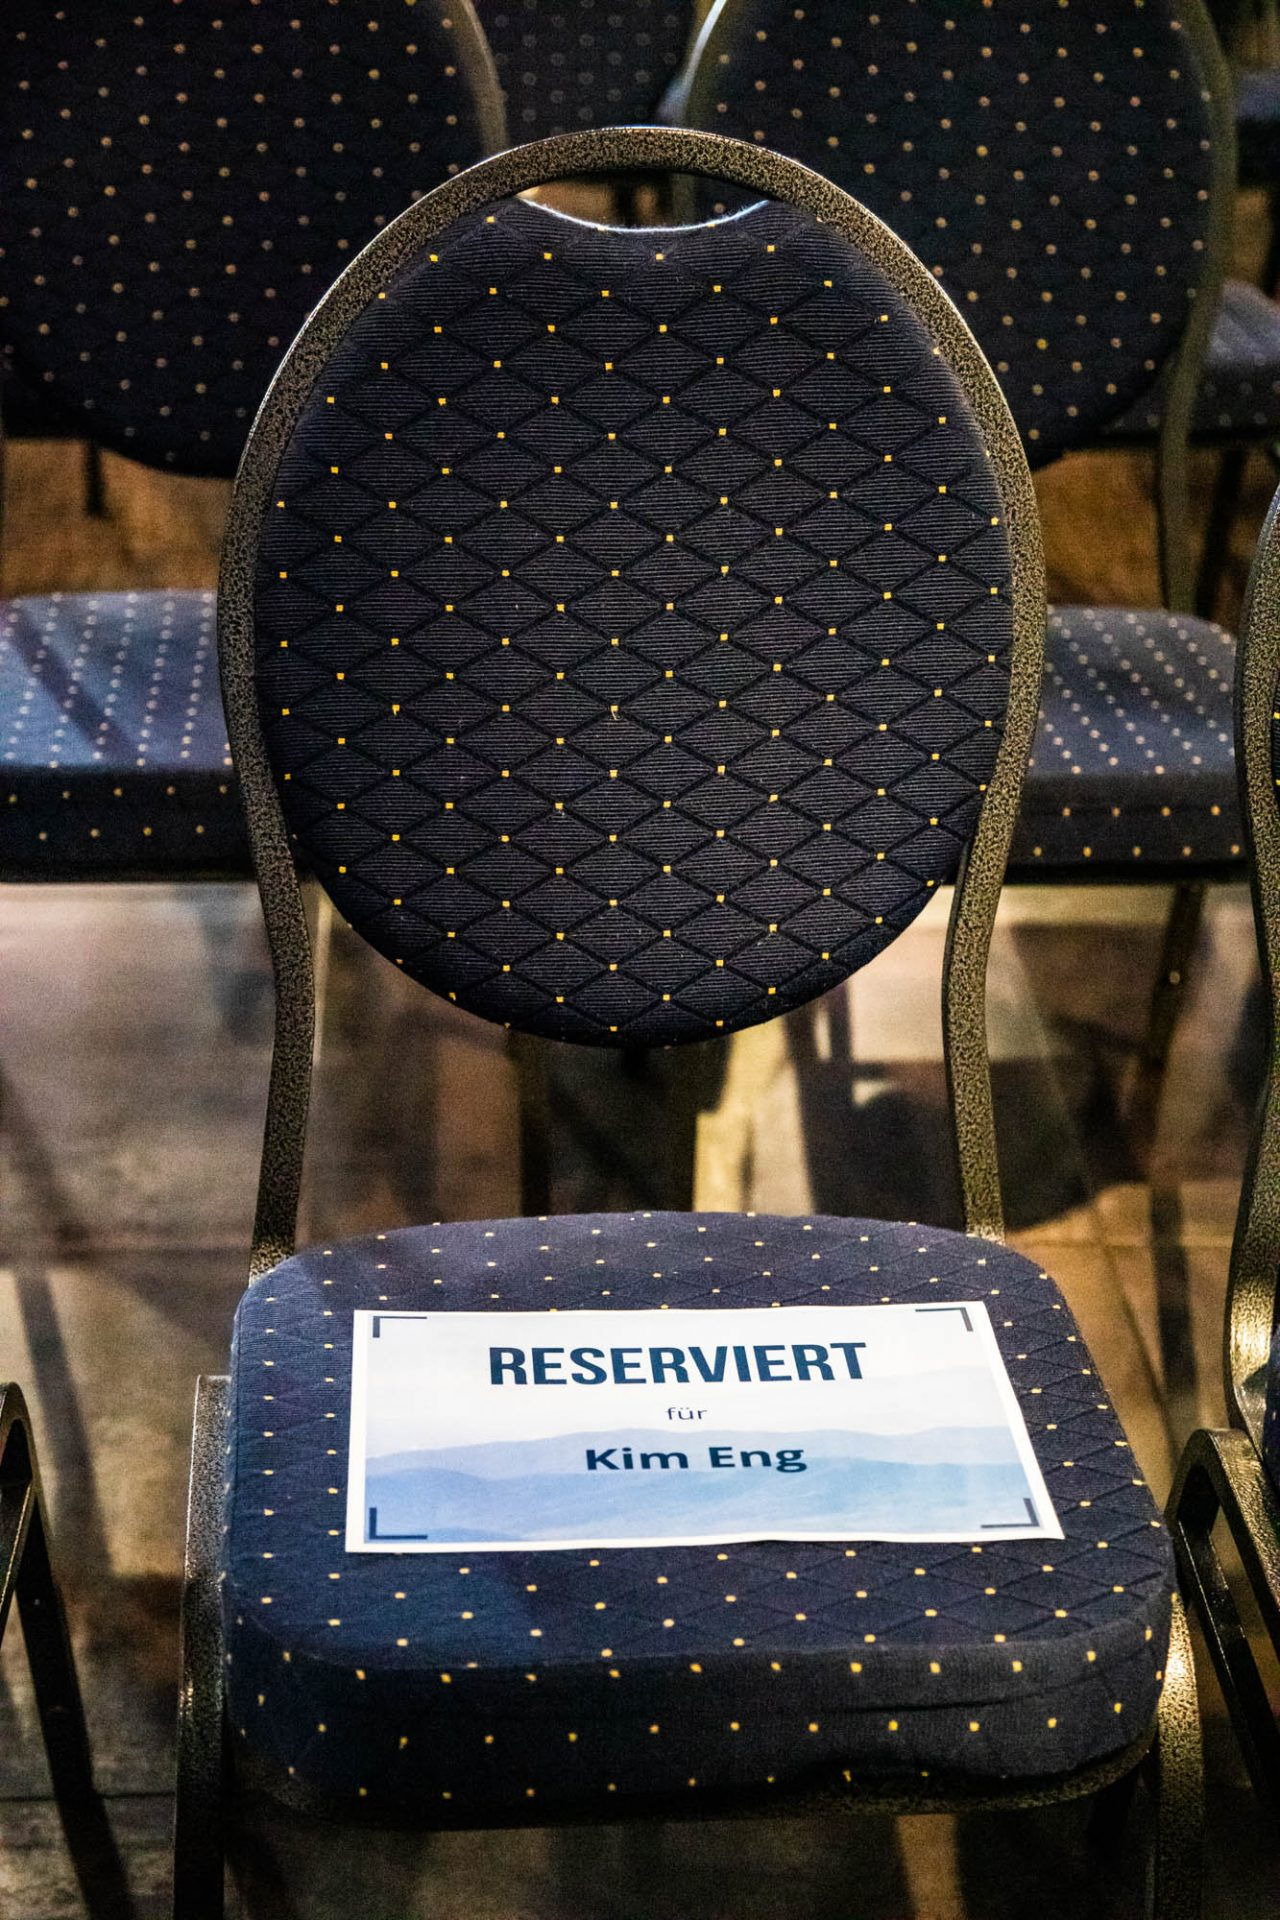 Eckhart Tolle Kim Eng Jetzt oder Nie Tour, Retreat Linstow